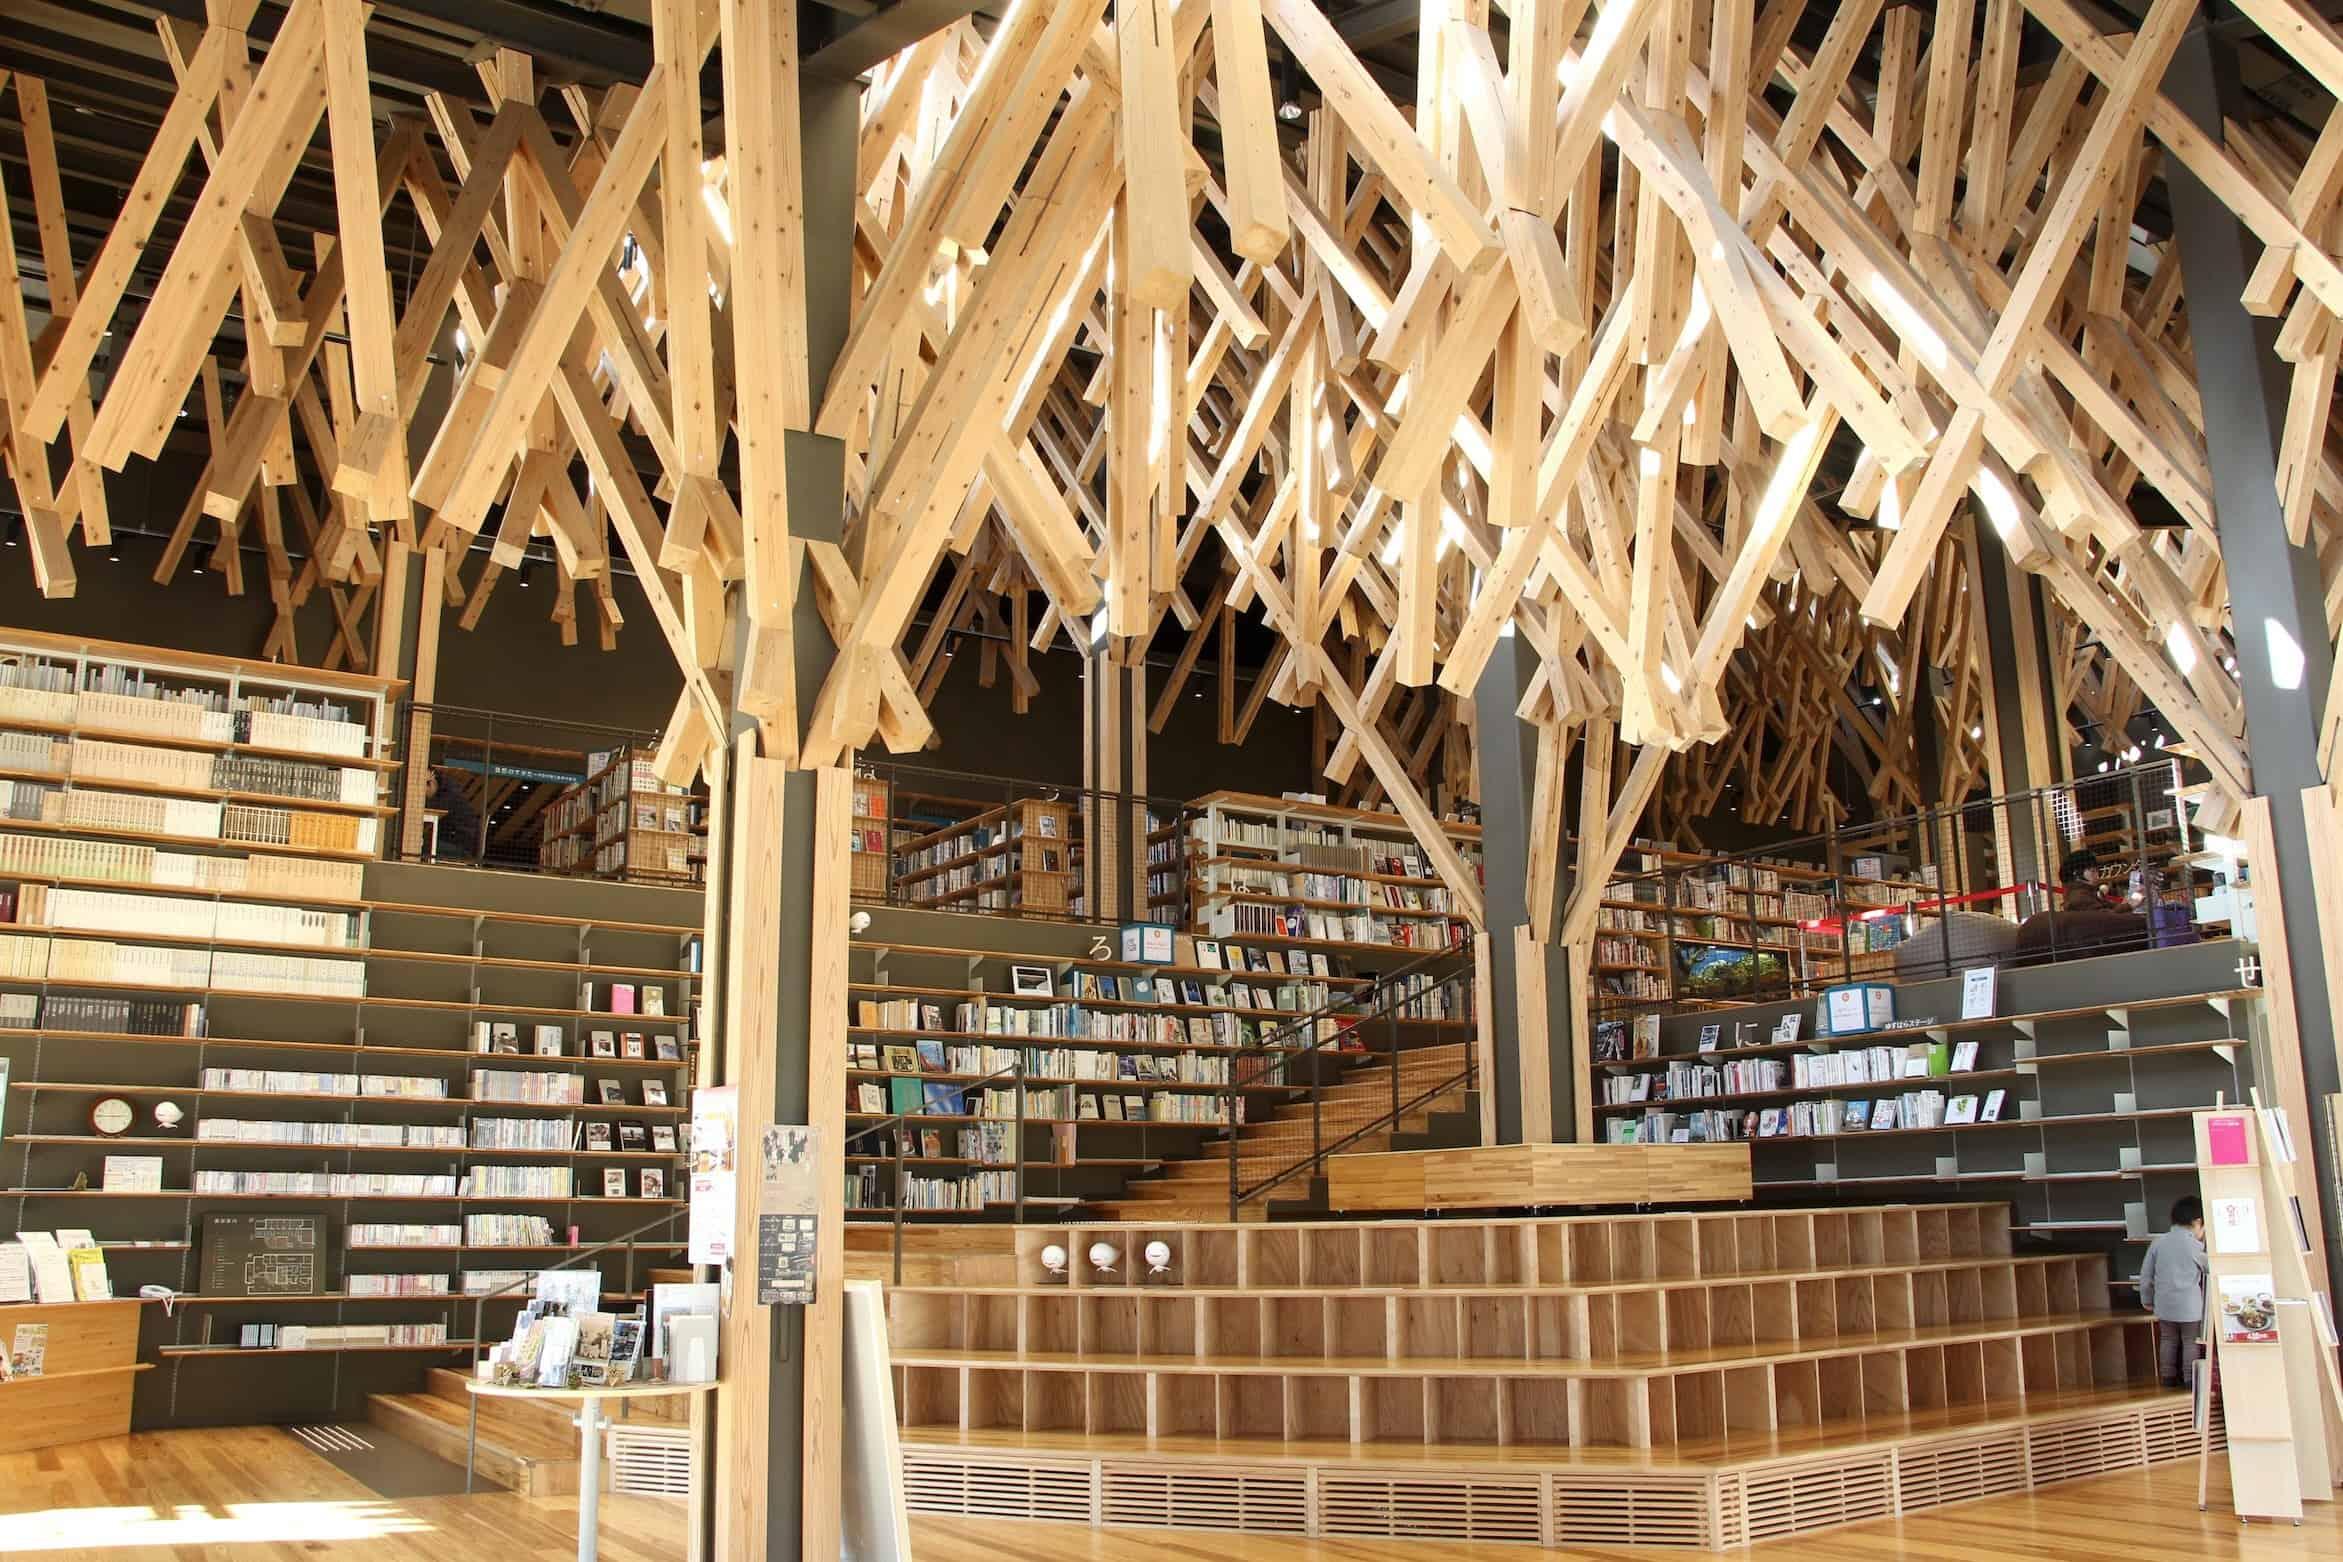 Yusuhara Kumo no Ue Community Library, Kengo Kuma